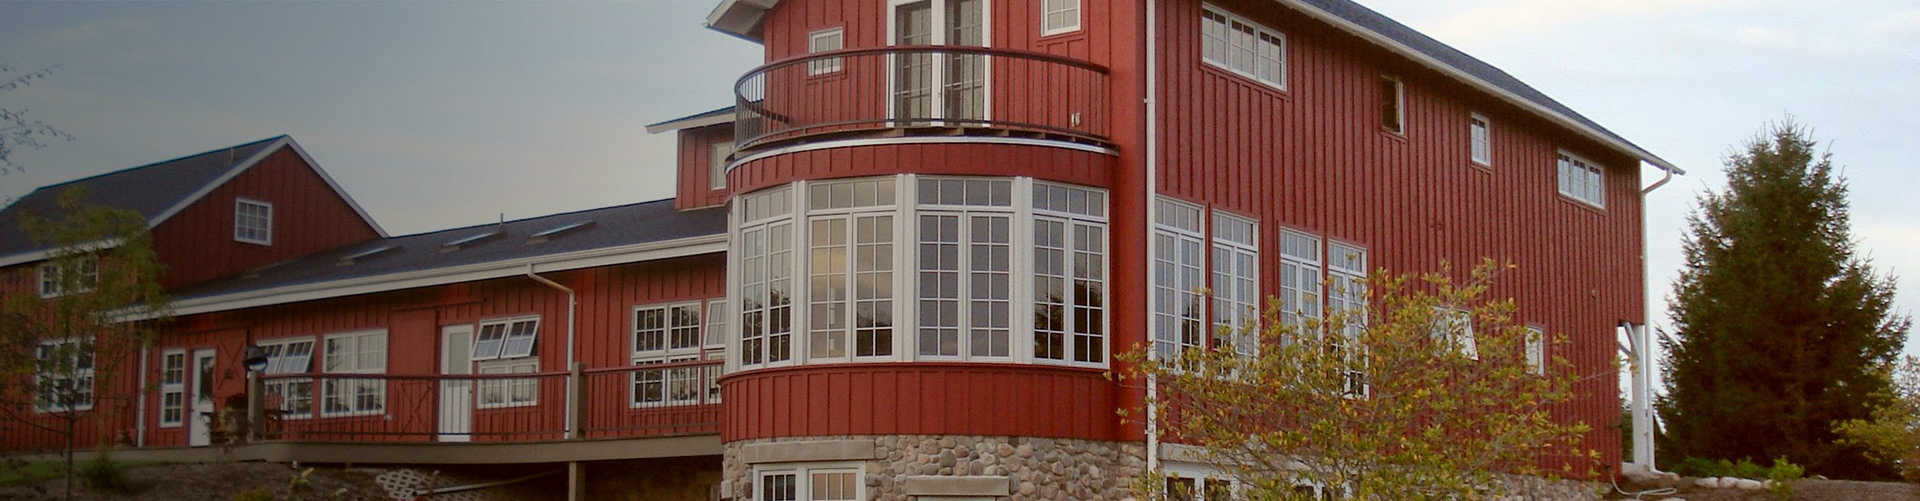 Wynncliff-RedBarn-1920x500-withgradient-